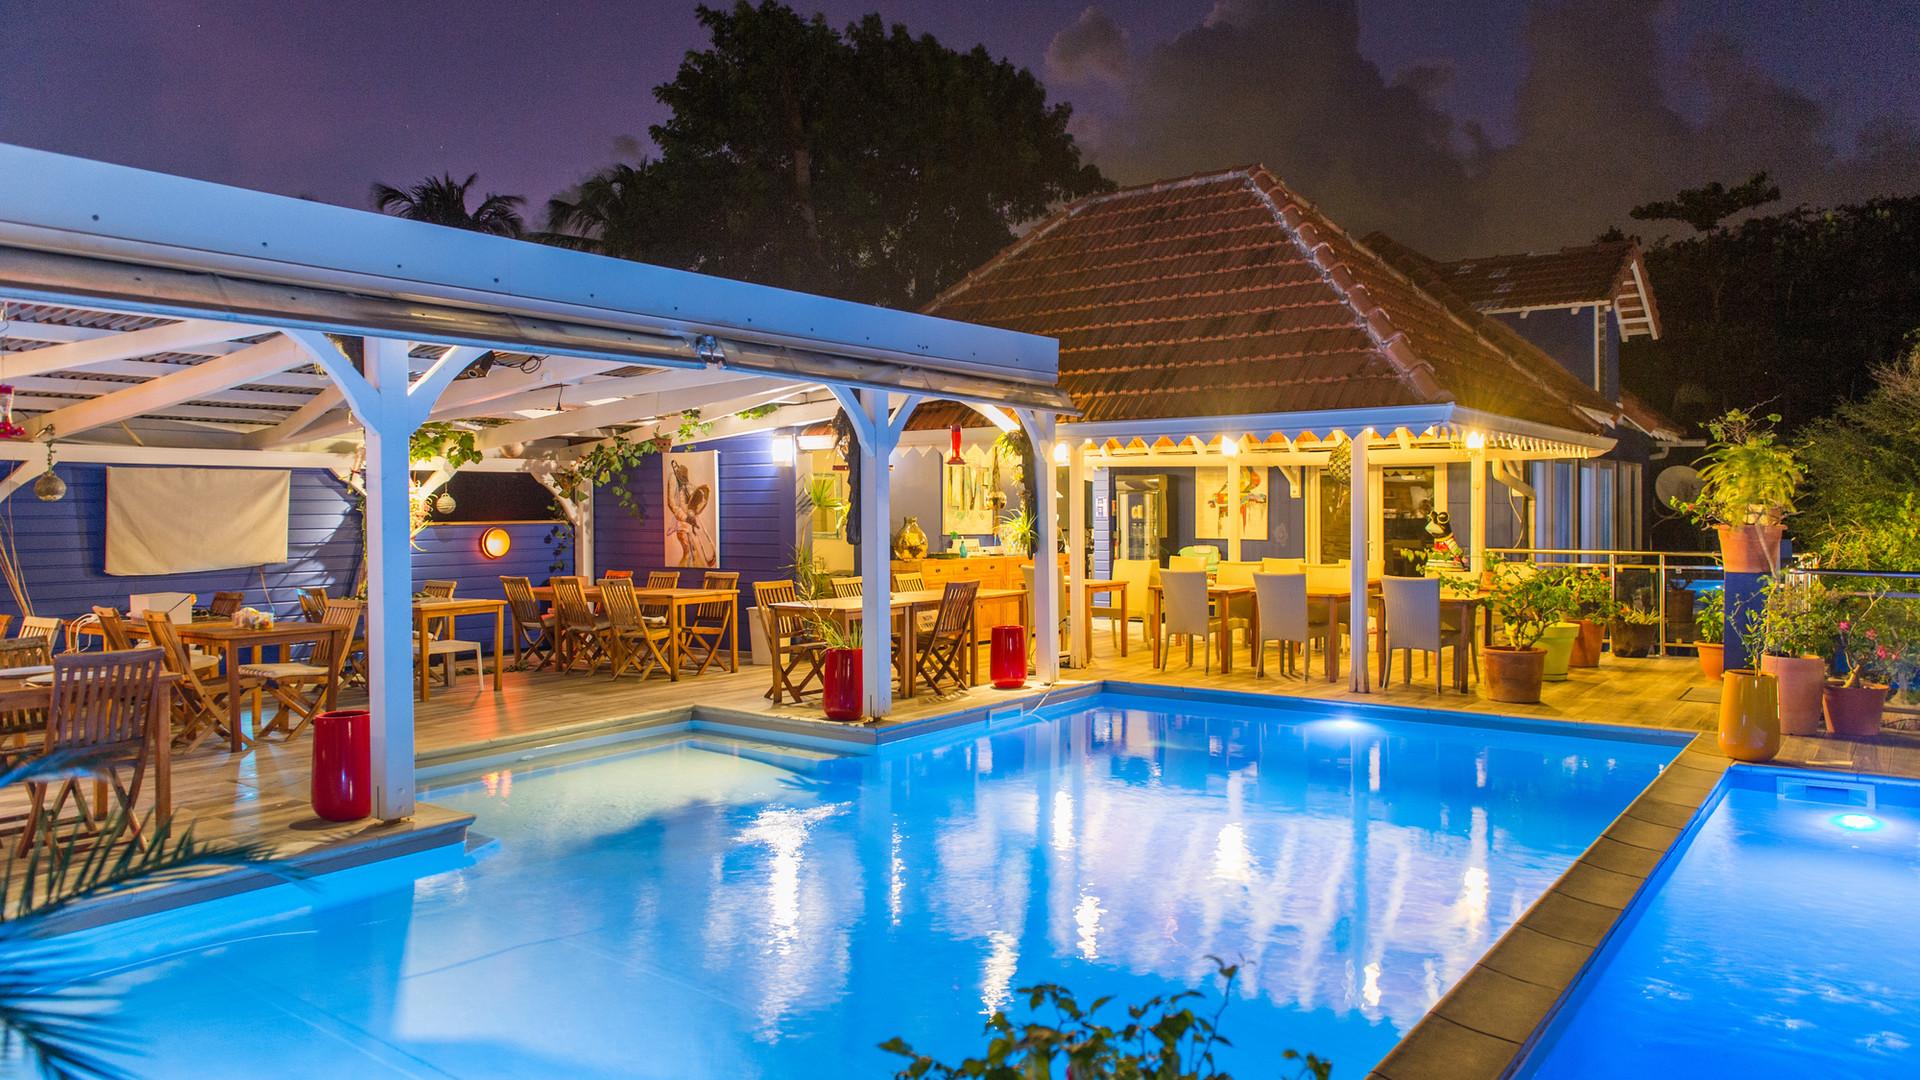 Ristorante piscina nuit103_9187.jpg